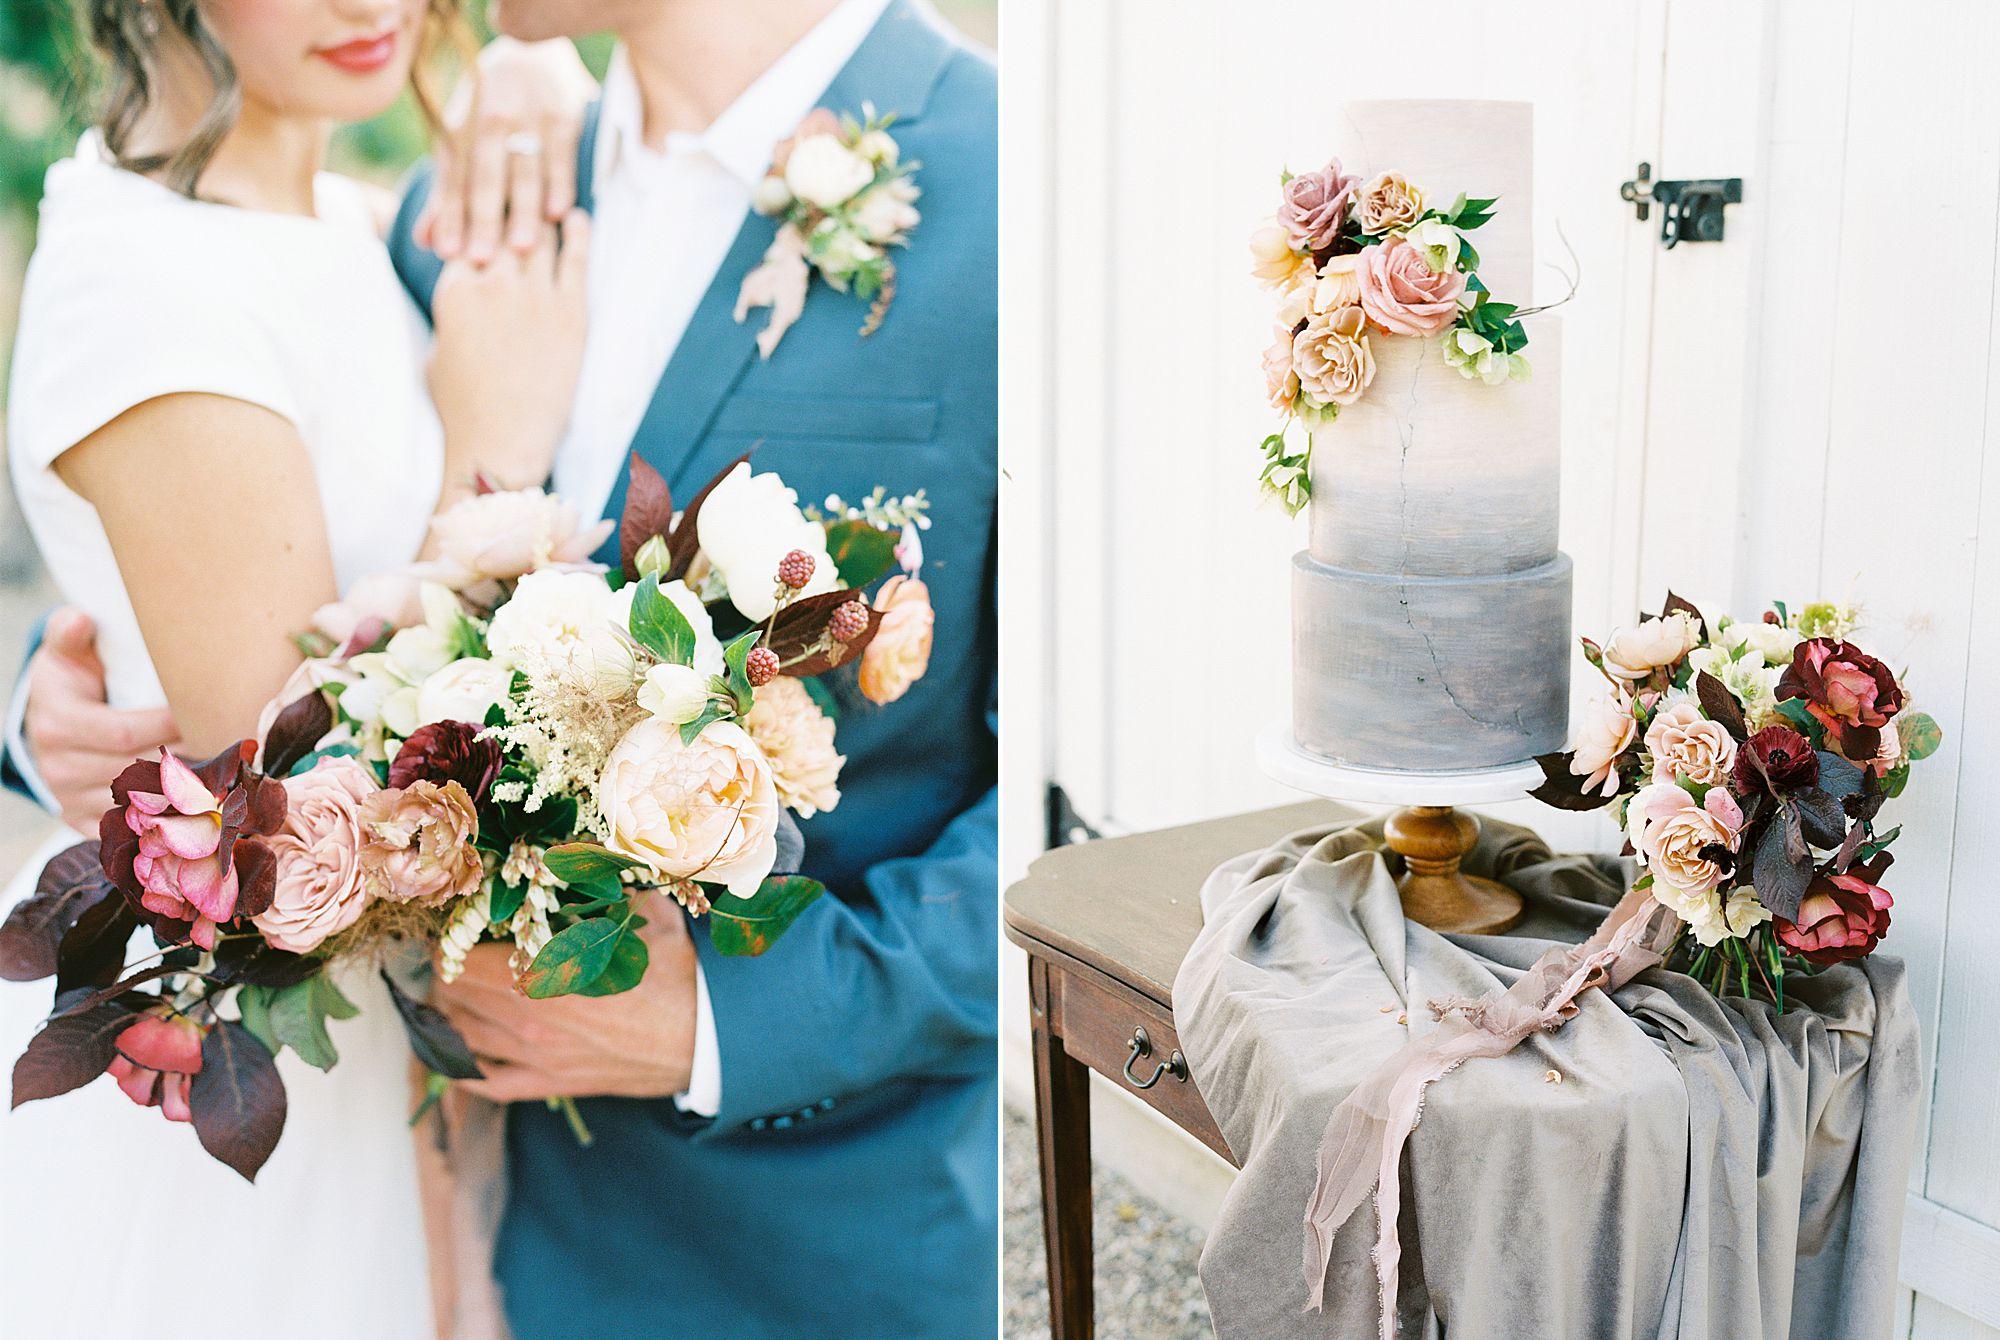 HammerSky Wedding Inspiration Featured on Hey Wedding Lady with Vanessa Noel Events - Ashley Baumgartner - SLO Wedding Photographer_0007.jpg